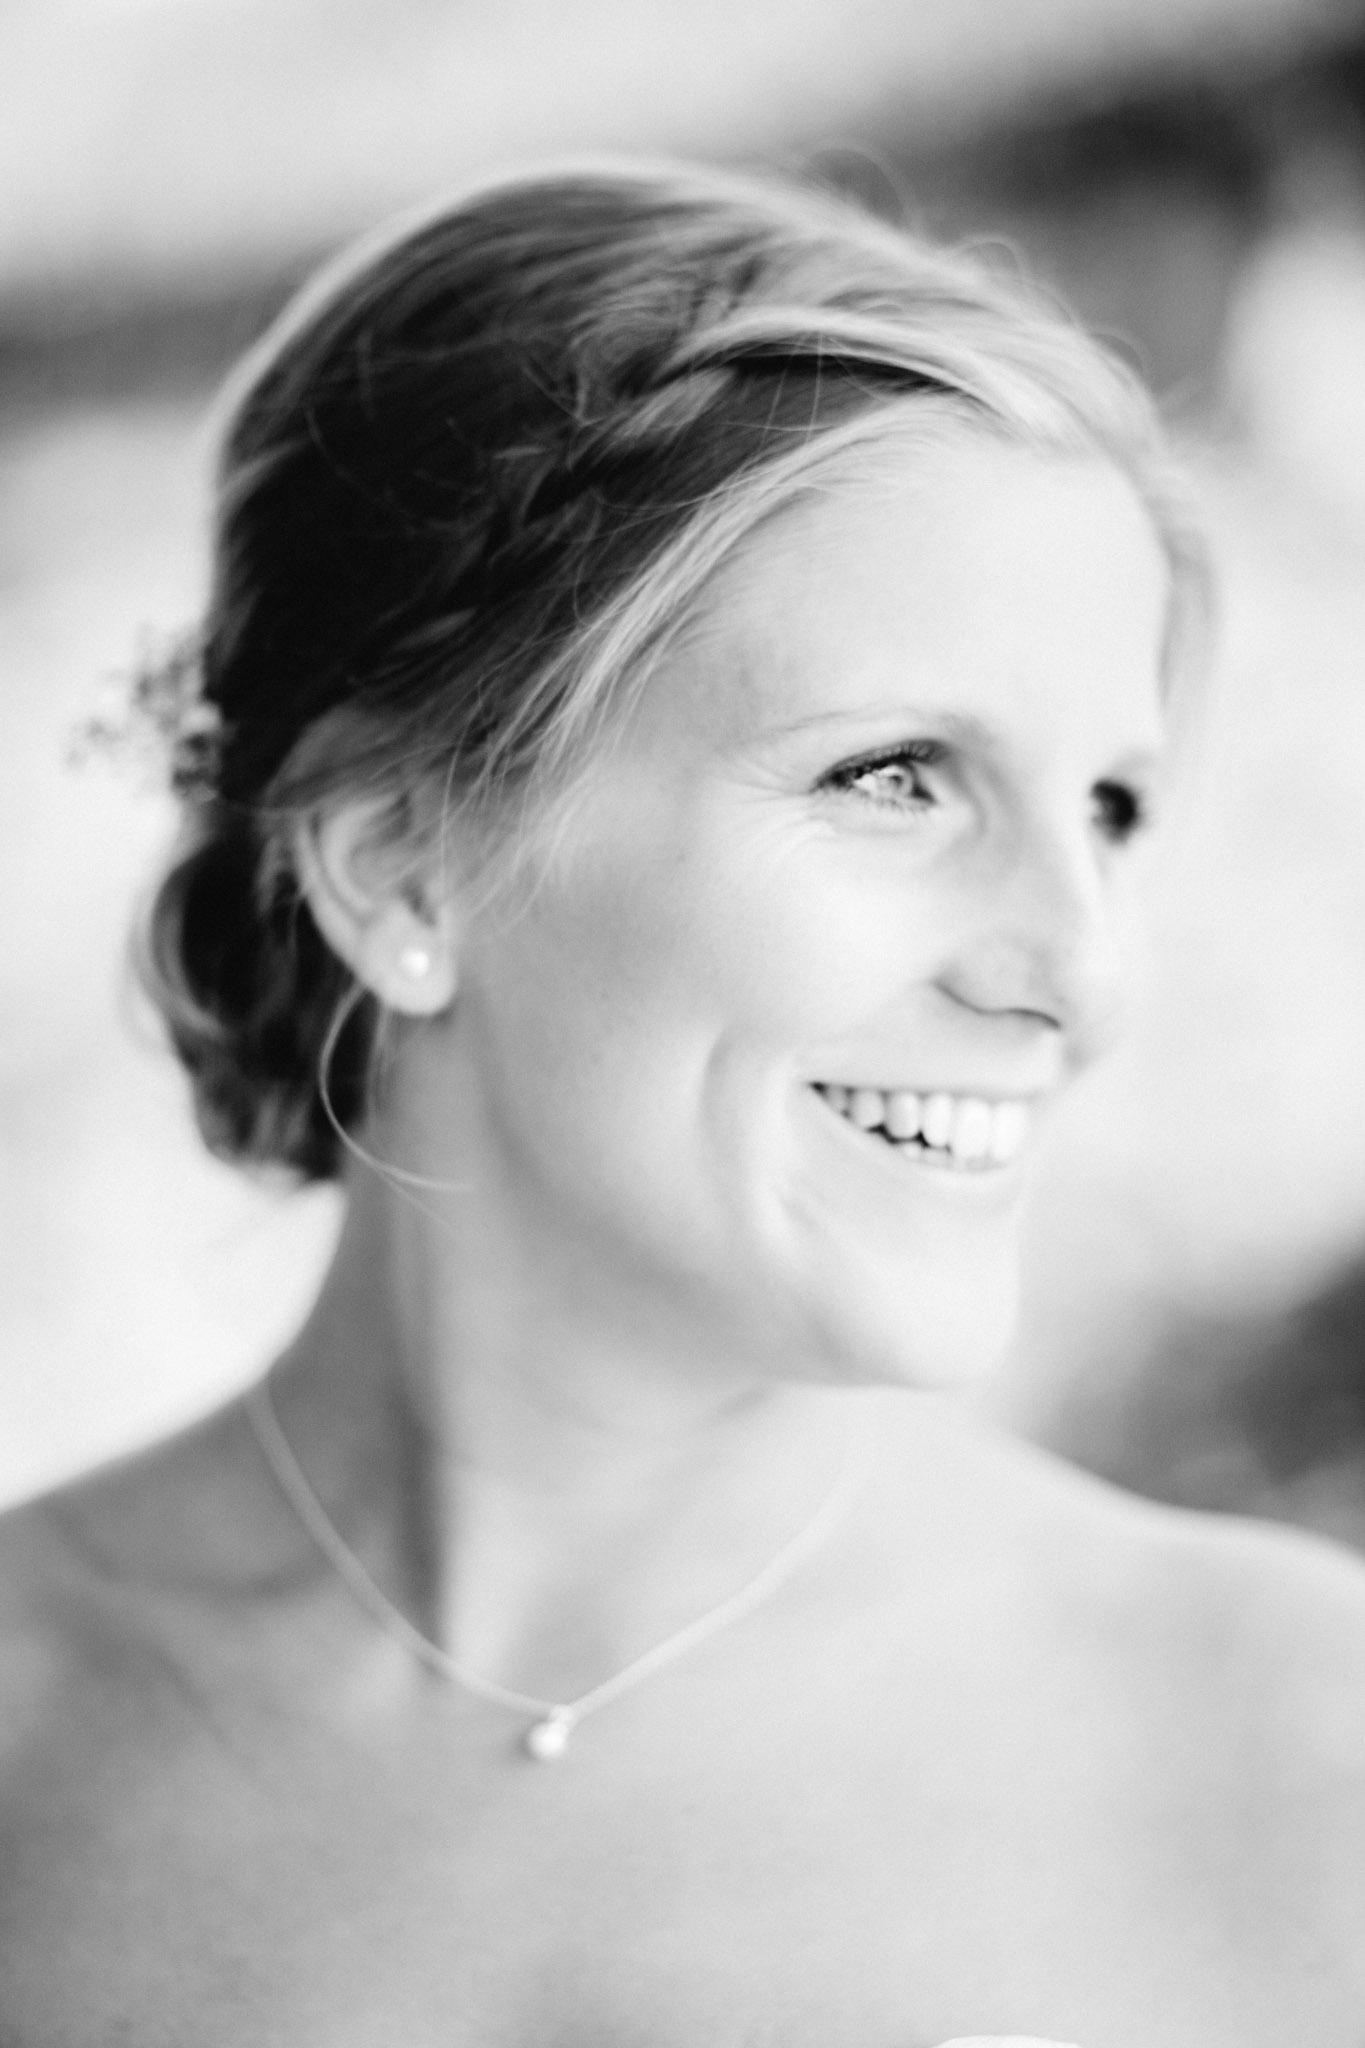 Lilienhof-Freiburg-Hochzeit-Pia-Anna-Christian-Wedding-Photography-FS-36.jpg